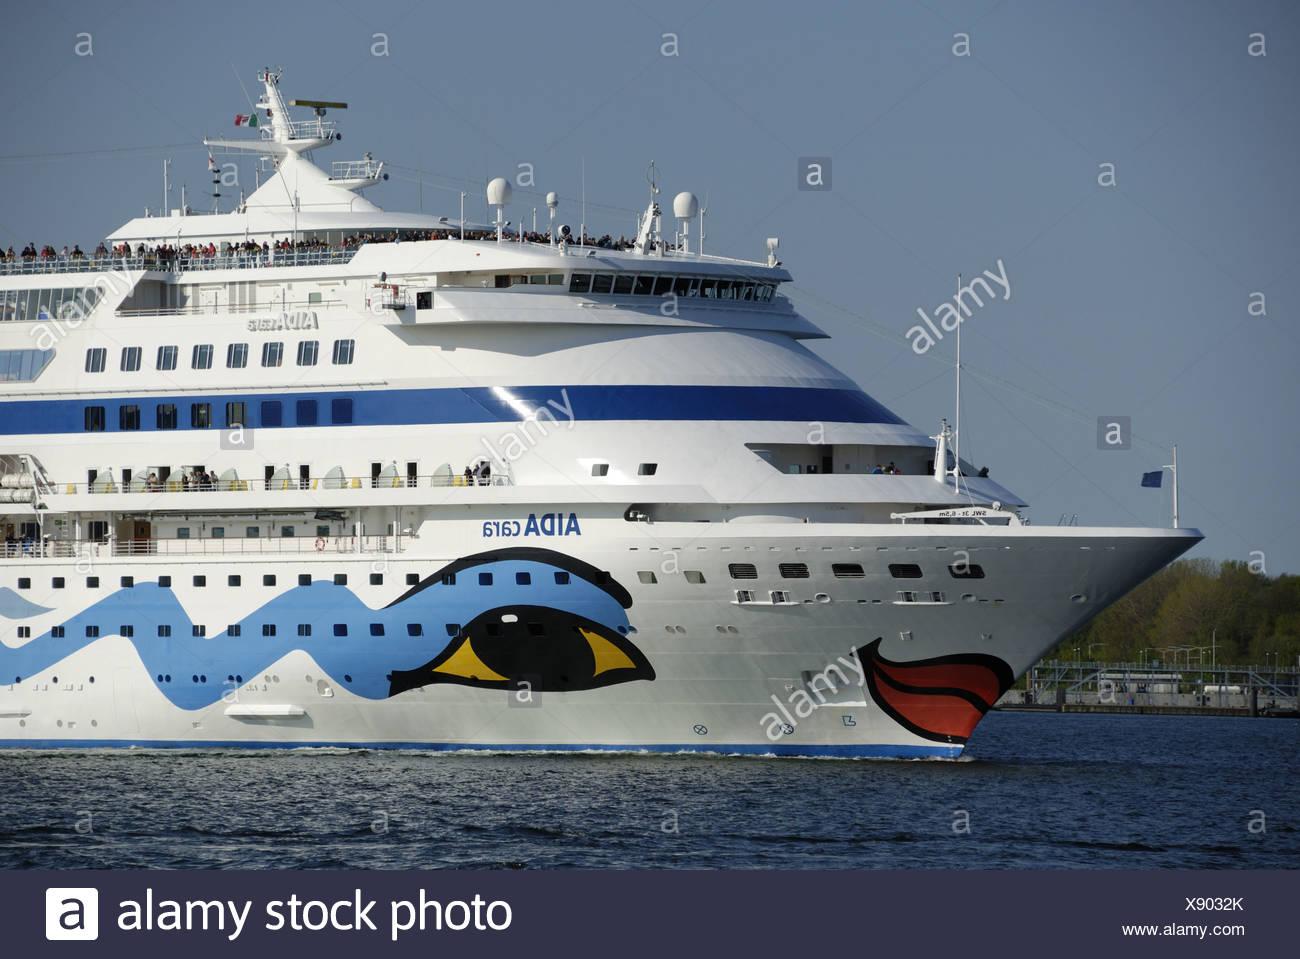 MS AIDA cara in Kiel - Stock Image